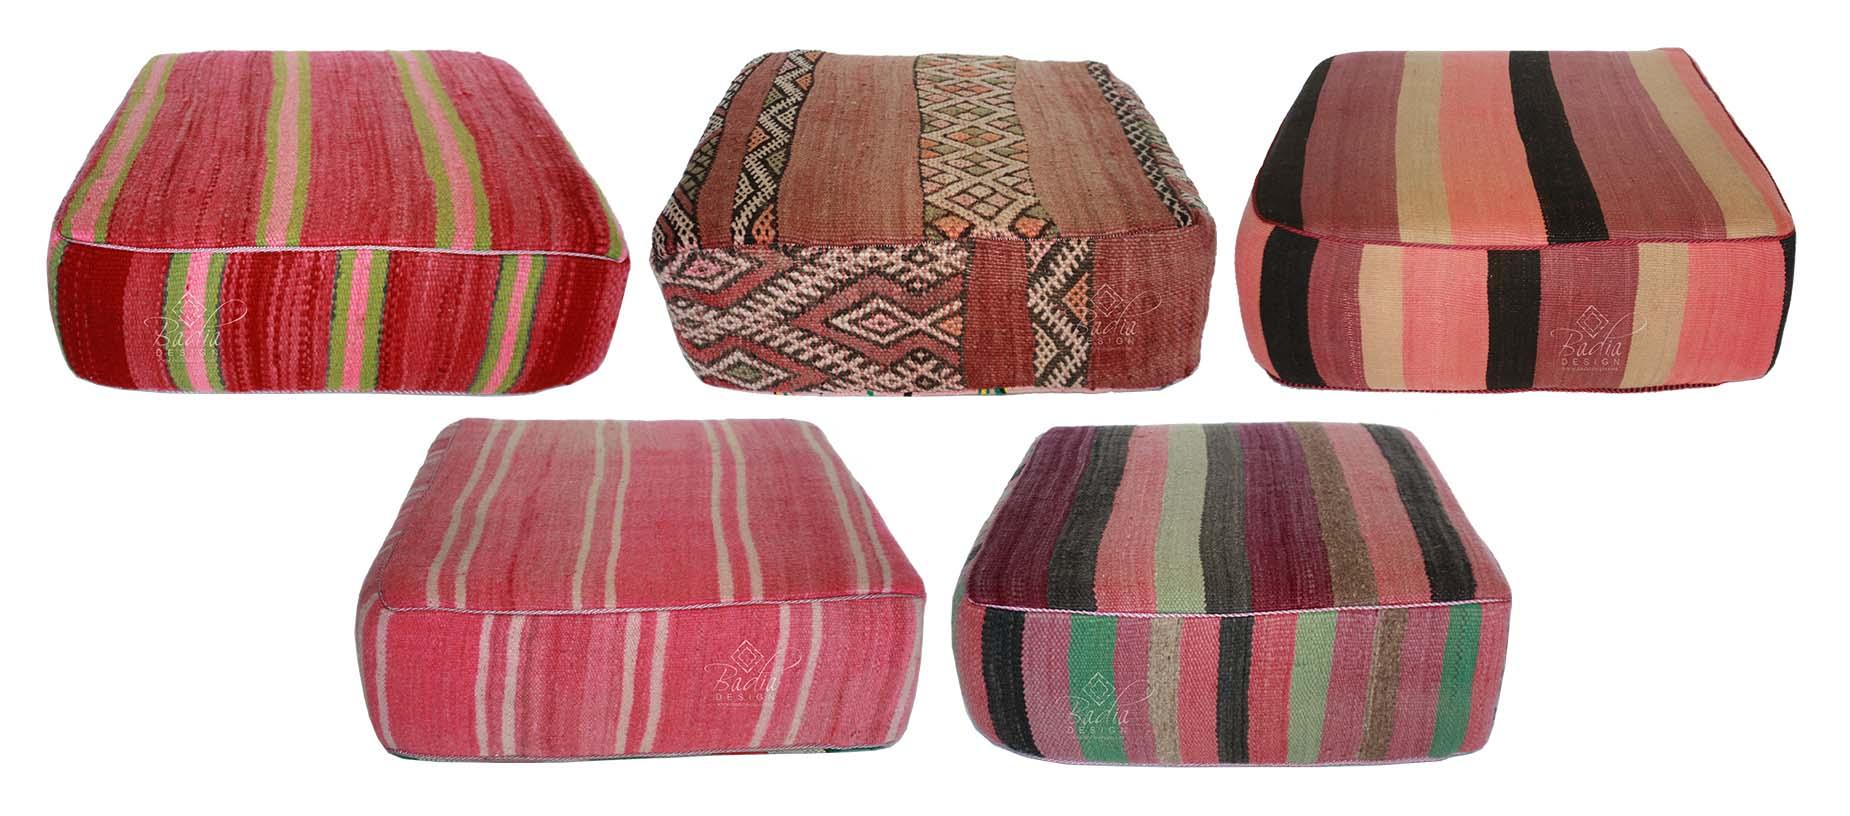 square-shaped-moroccan-kilim-floor-cushion-fp706.jpg